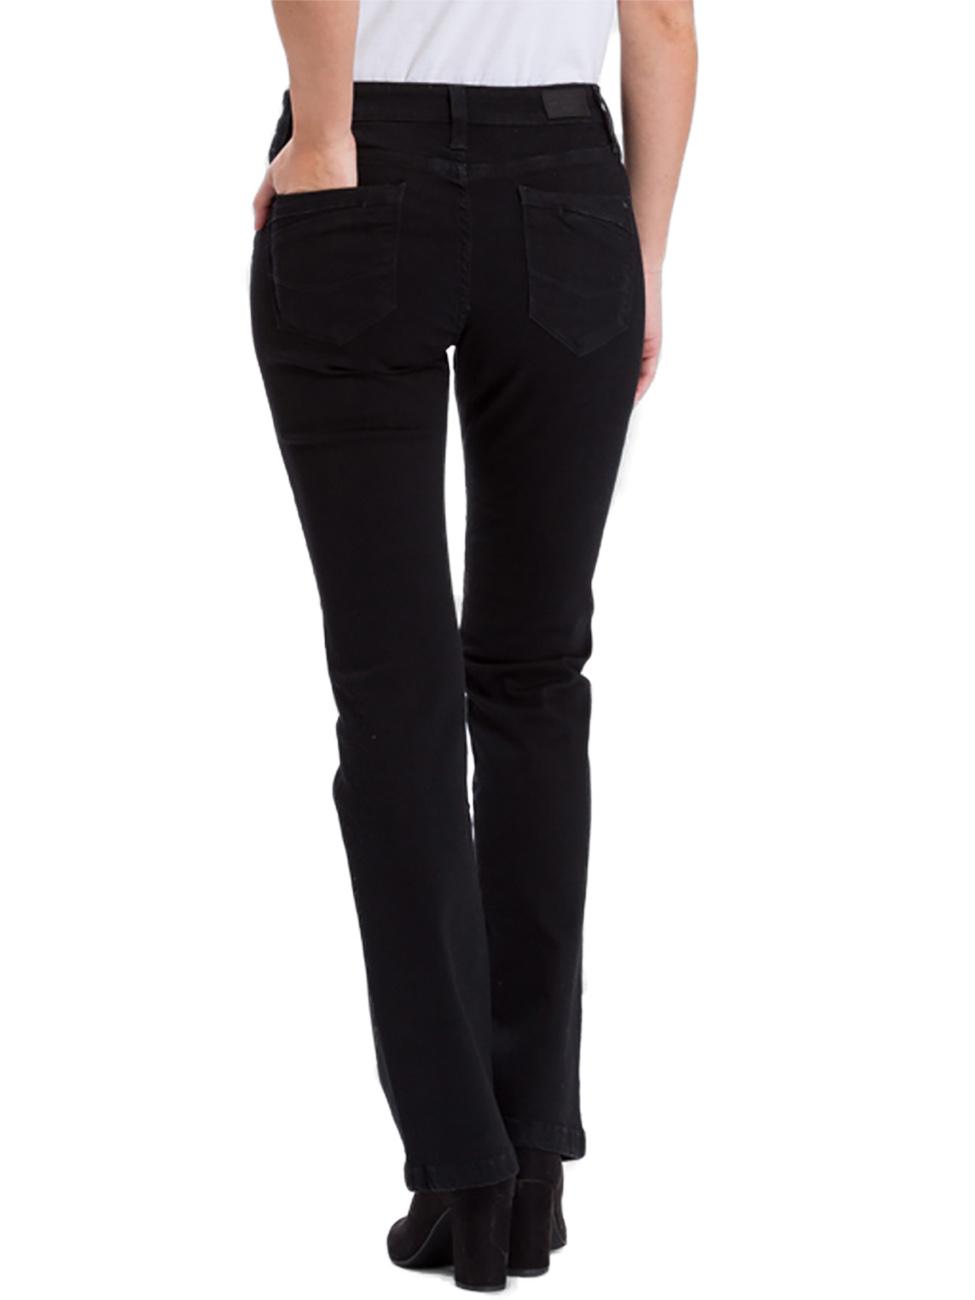 cross-jeans-damen-jeans-lauren-bootcut-schwarz-black-black, 55.45 EUR @ jeans